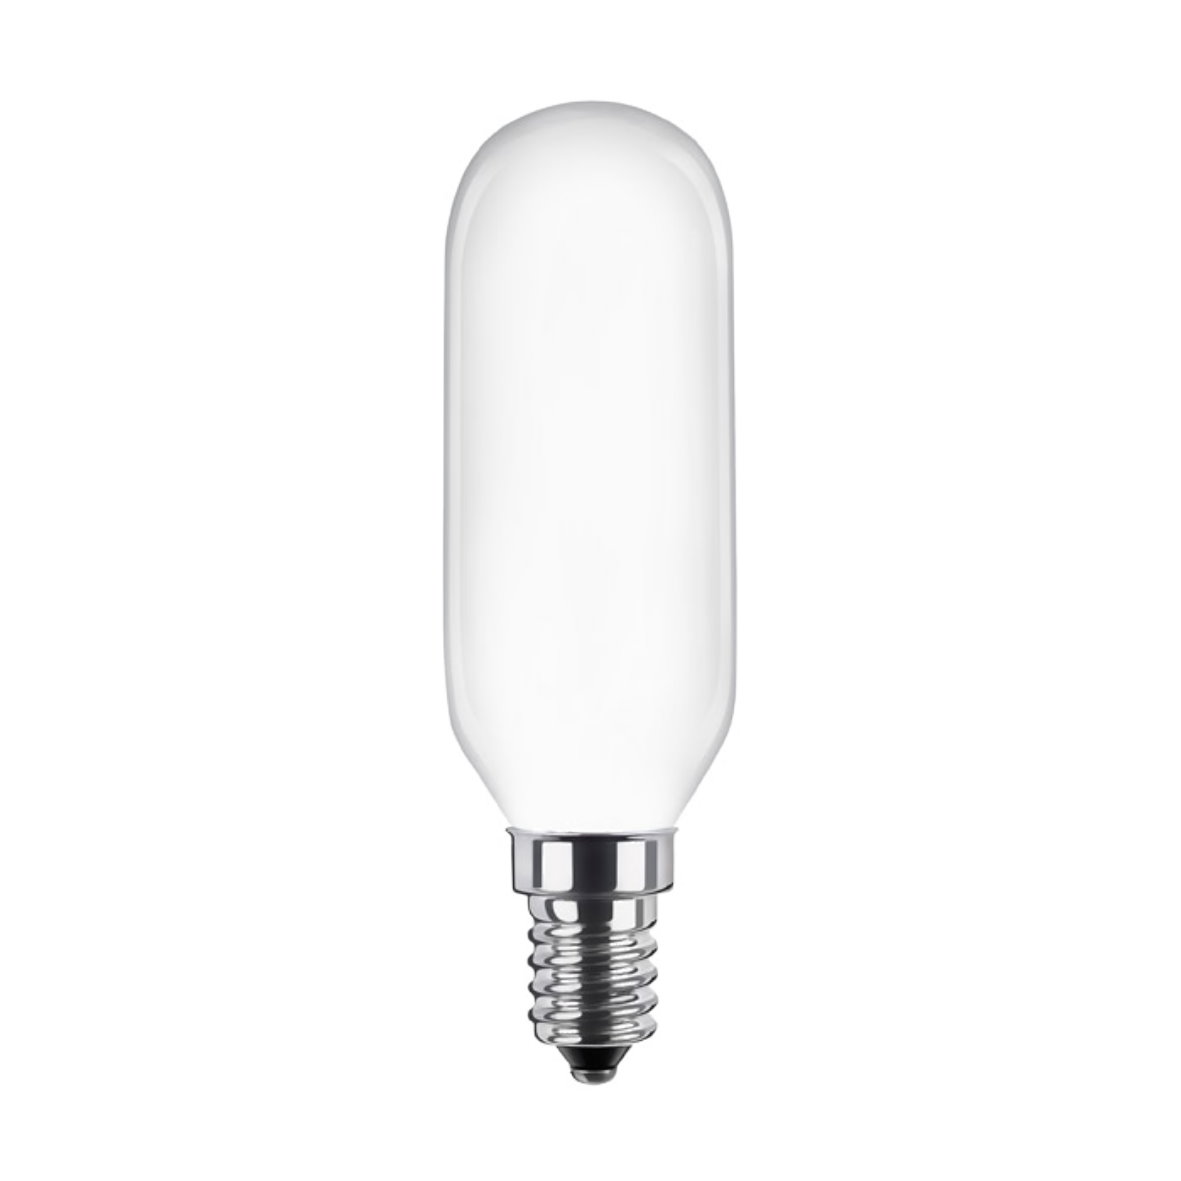 Segula smd LED tête rond e14 e27 ampoules Dimmable